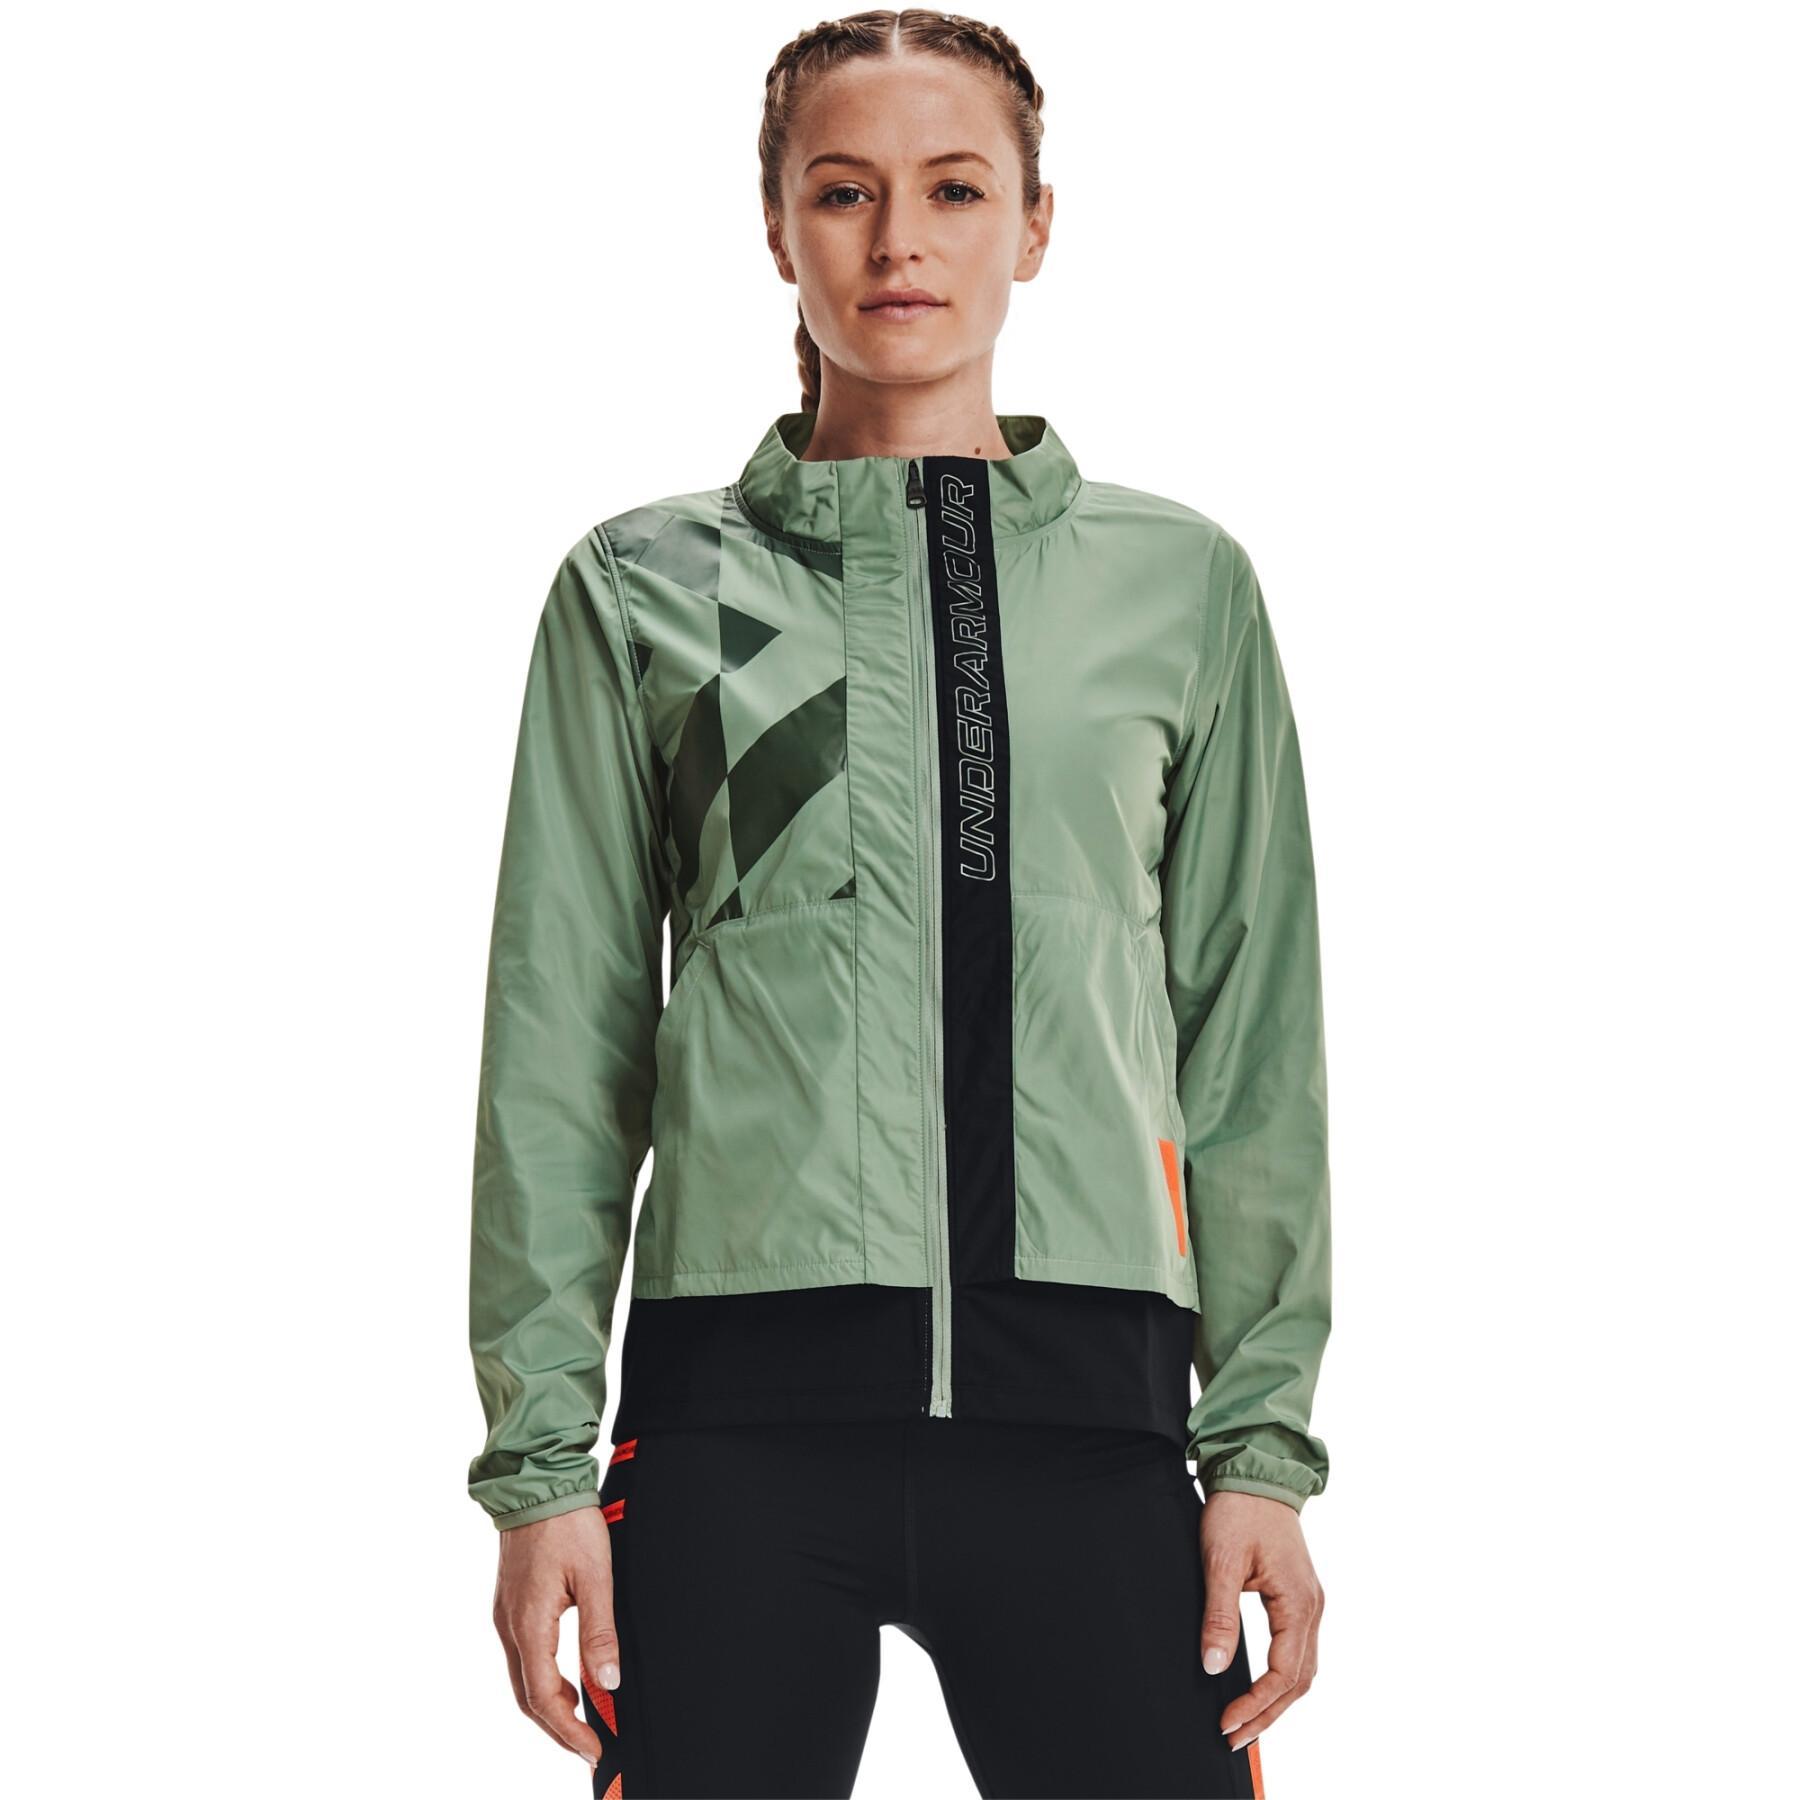 Women's jacket Under Armour Run Anywhere Laser